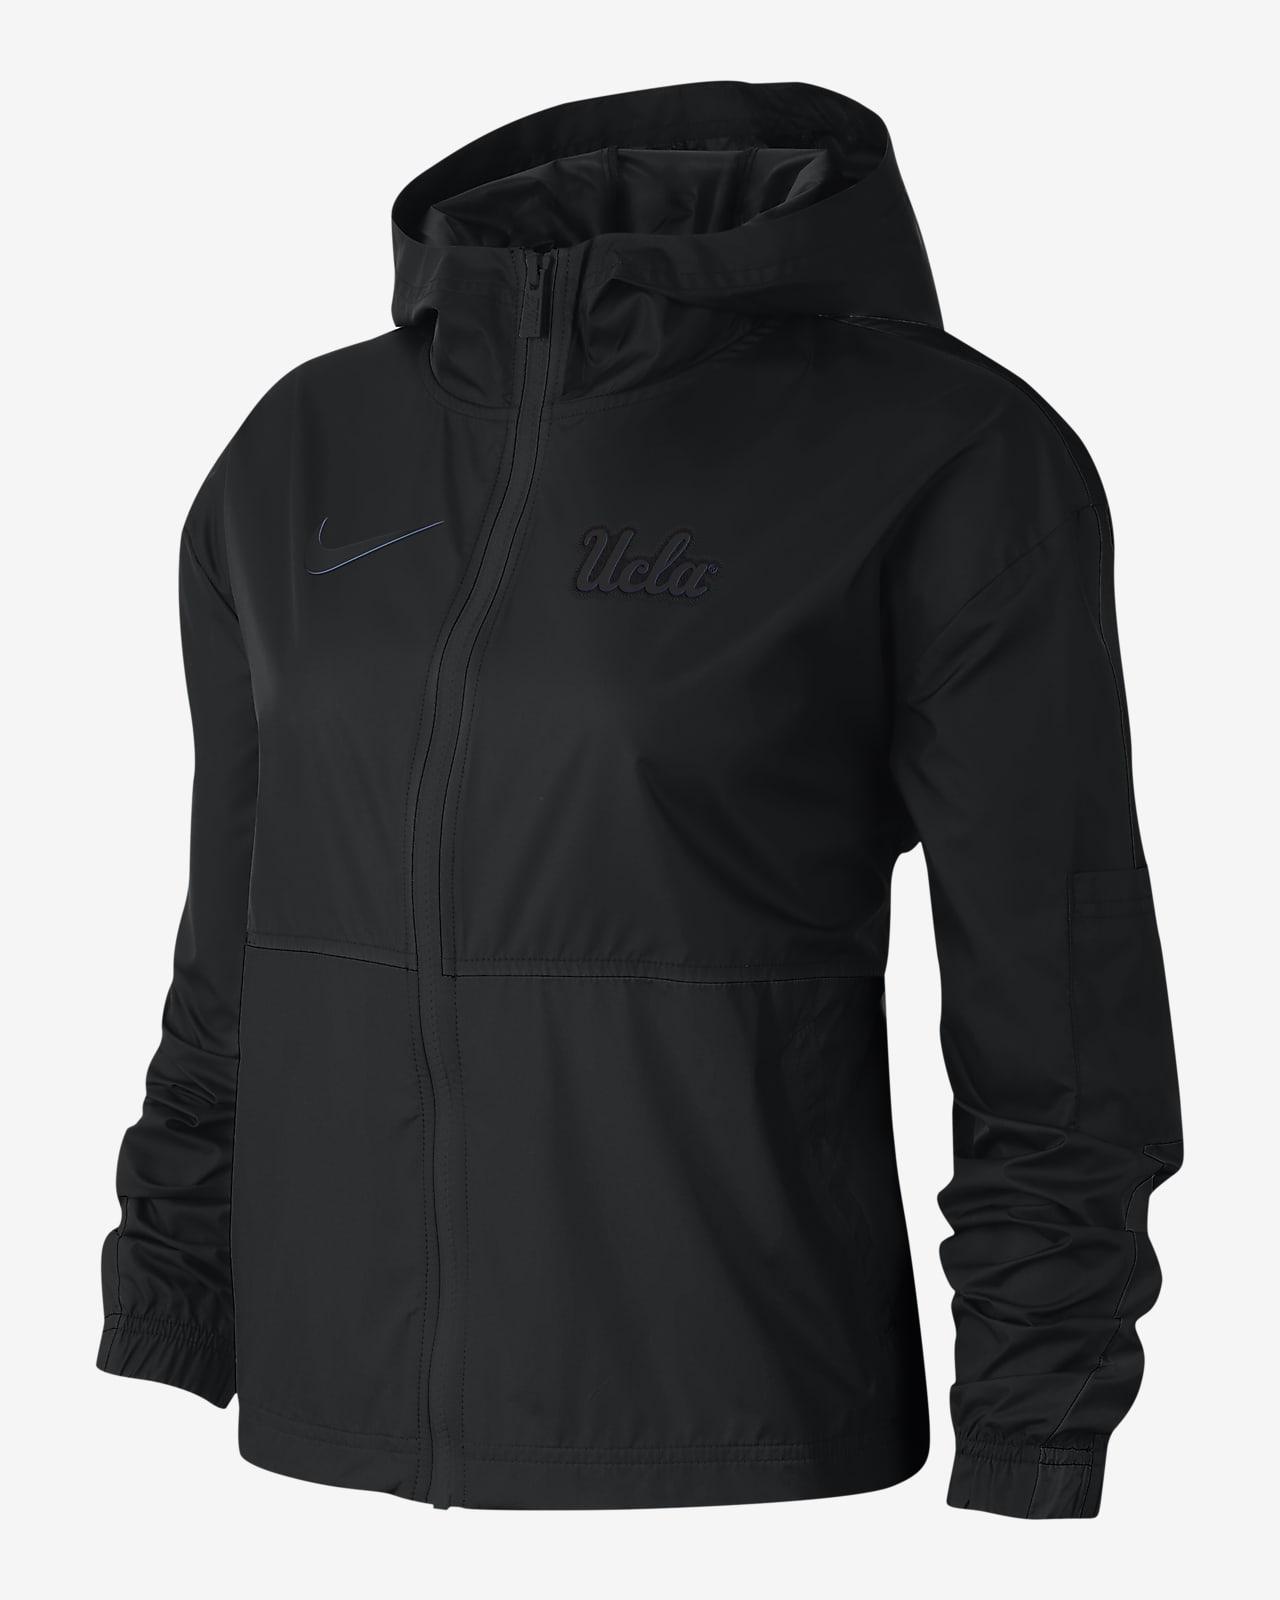 Nike College Windrunner (UCLA) Women's Jacket